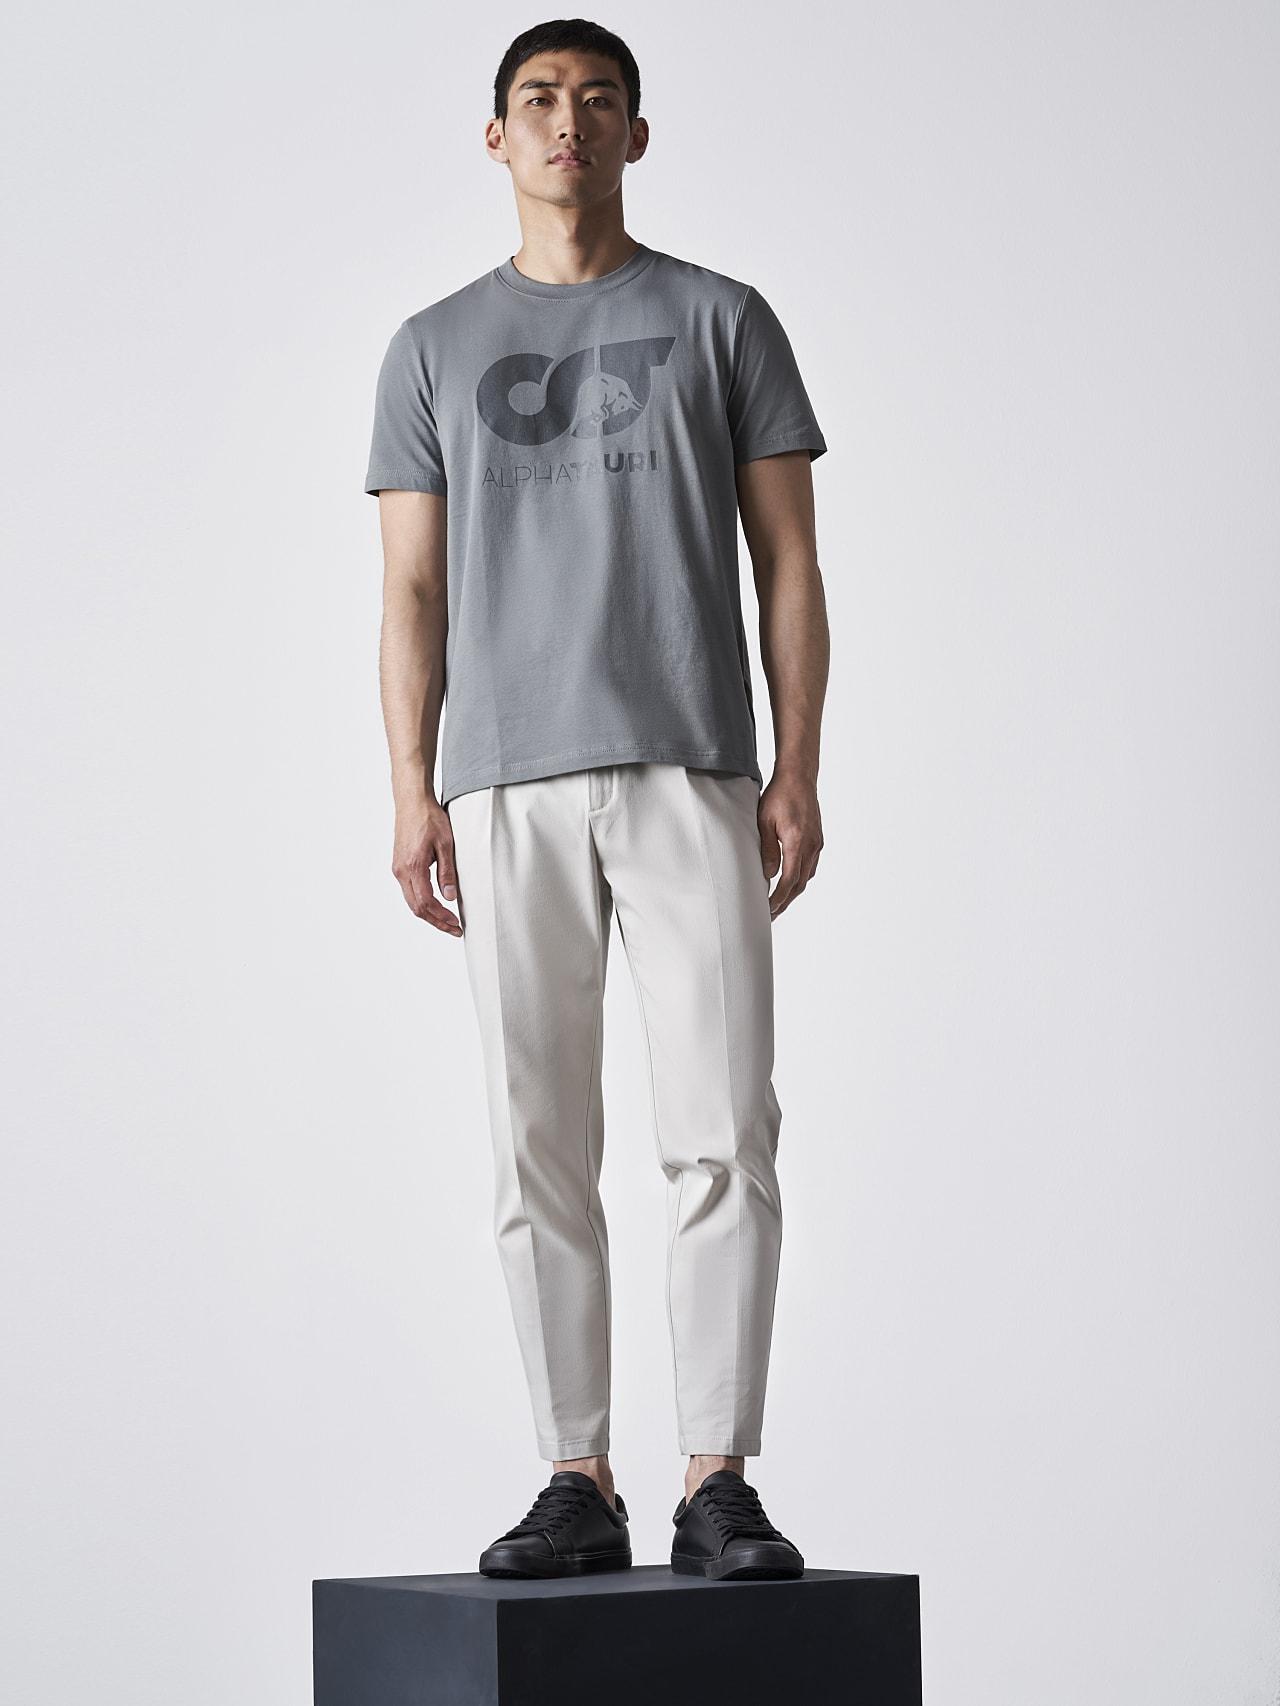 JERO V2.Y4.02 Signature Logo T-Shirt Grey Front Alpha Tauri